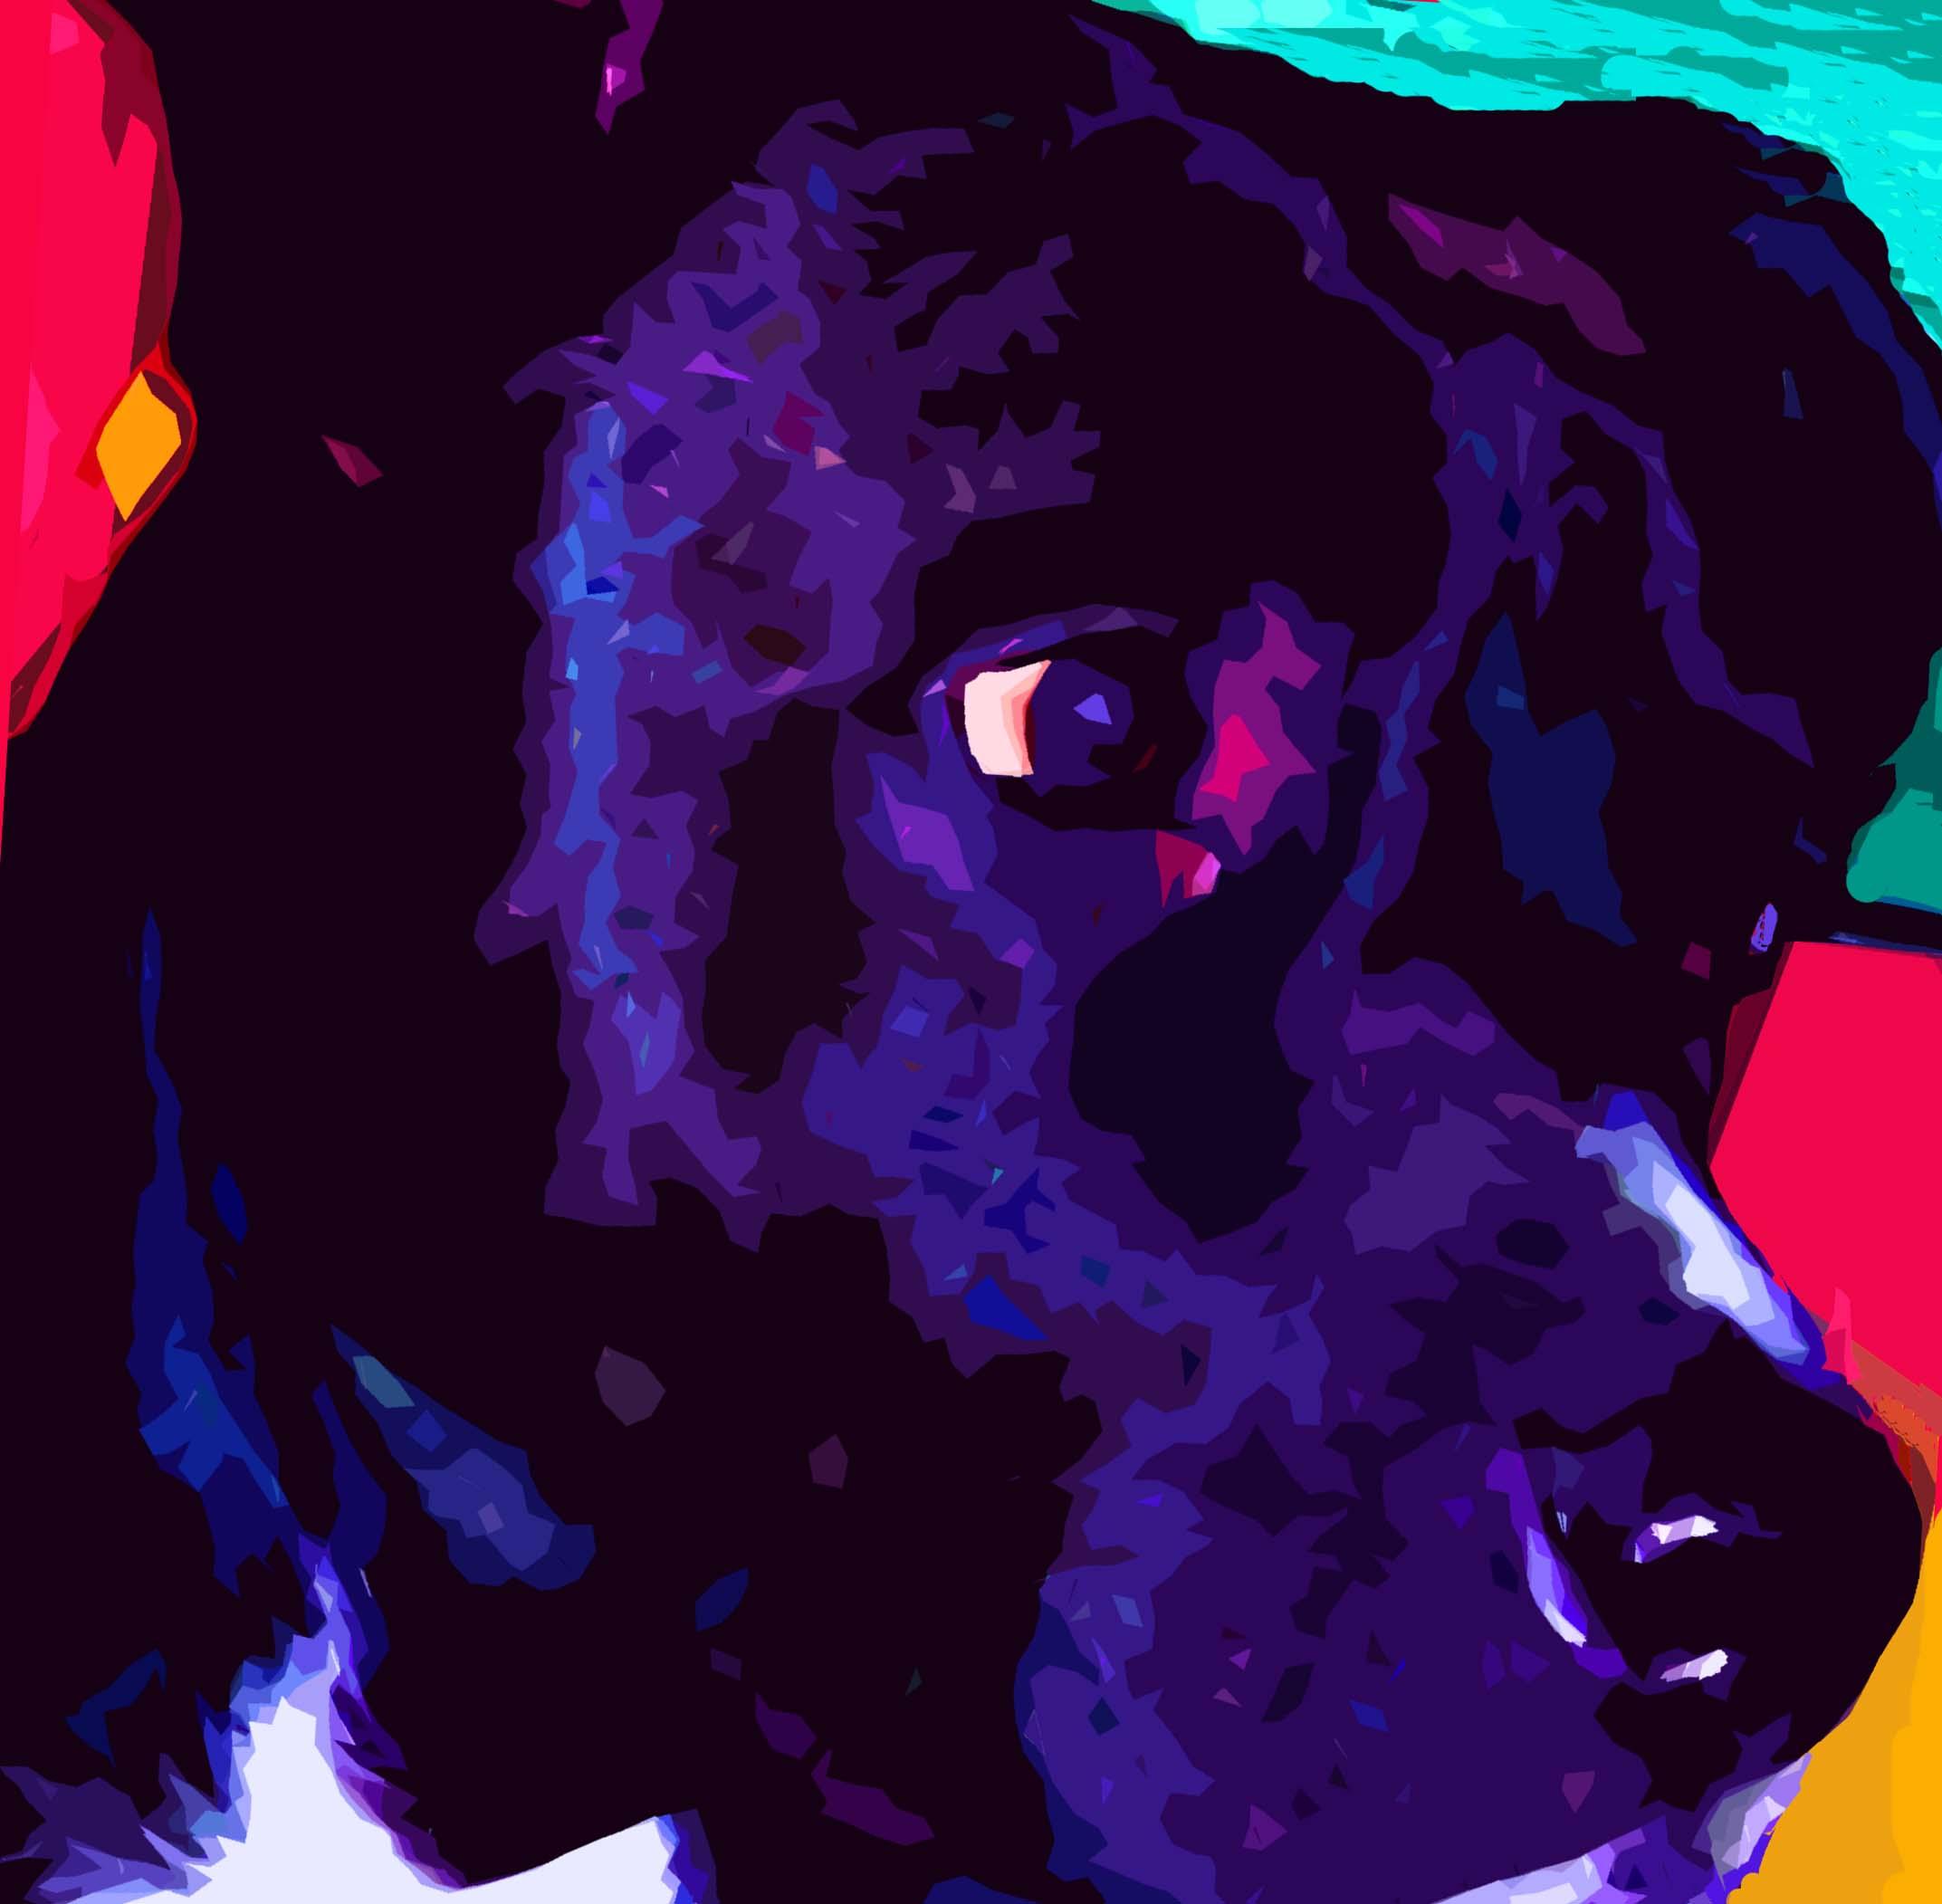 Black Pit Bull Mix Dog - Custom Digital Fine Art Pet Portrait by Animal Artist BZTAT